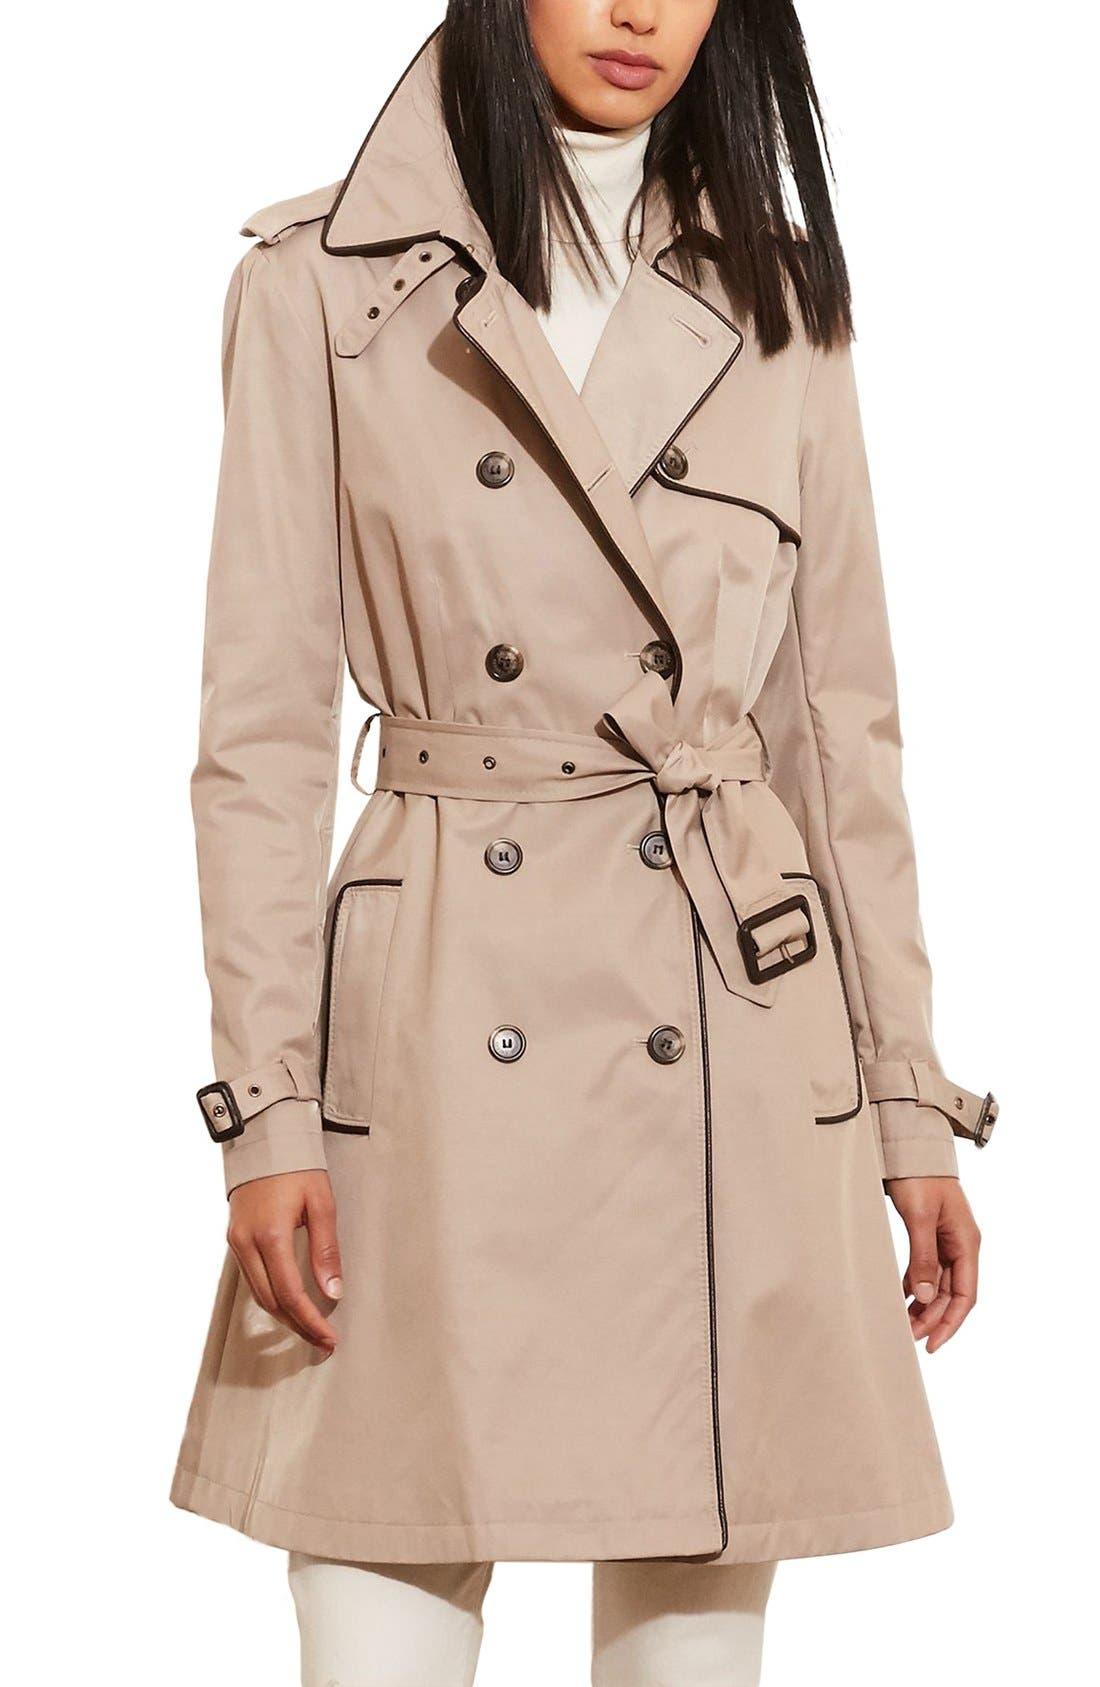 Alternate Image 1 Selected - Lauren Ralph Lauren Faux Leather Trim Trench Coat (Regular & Petite)